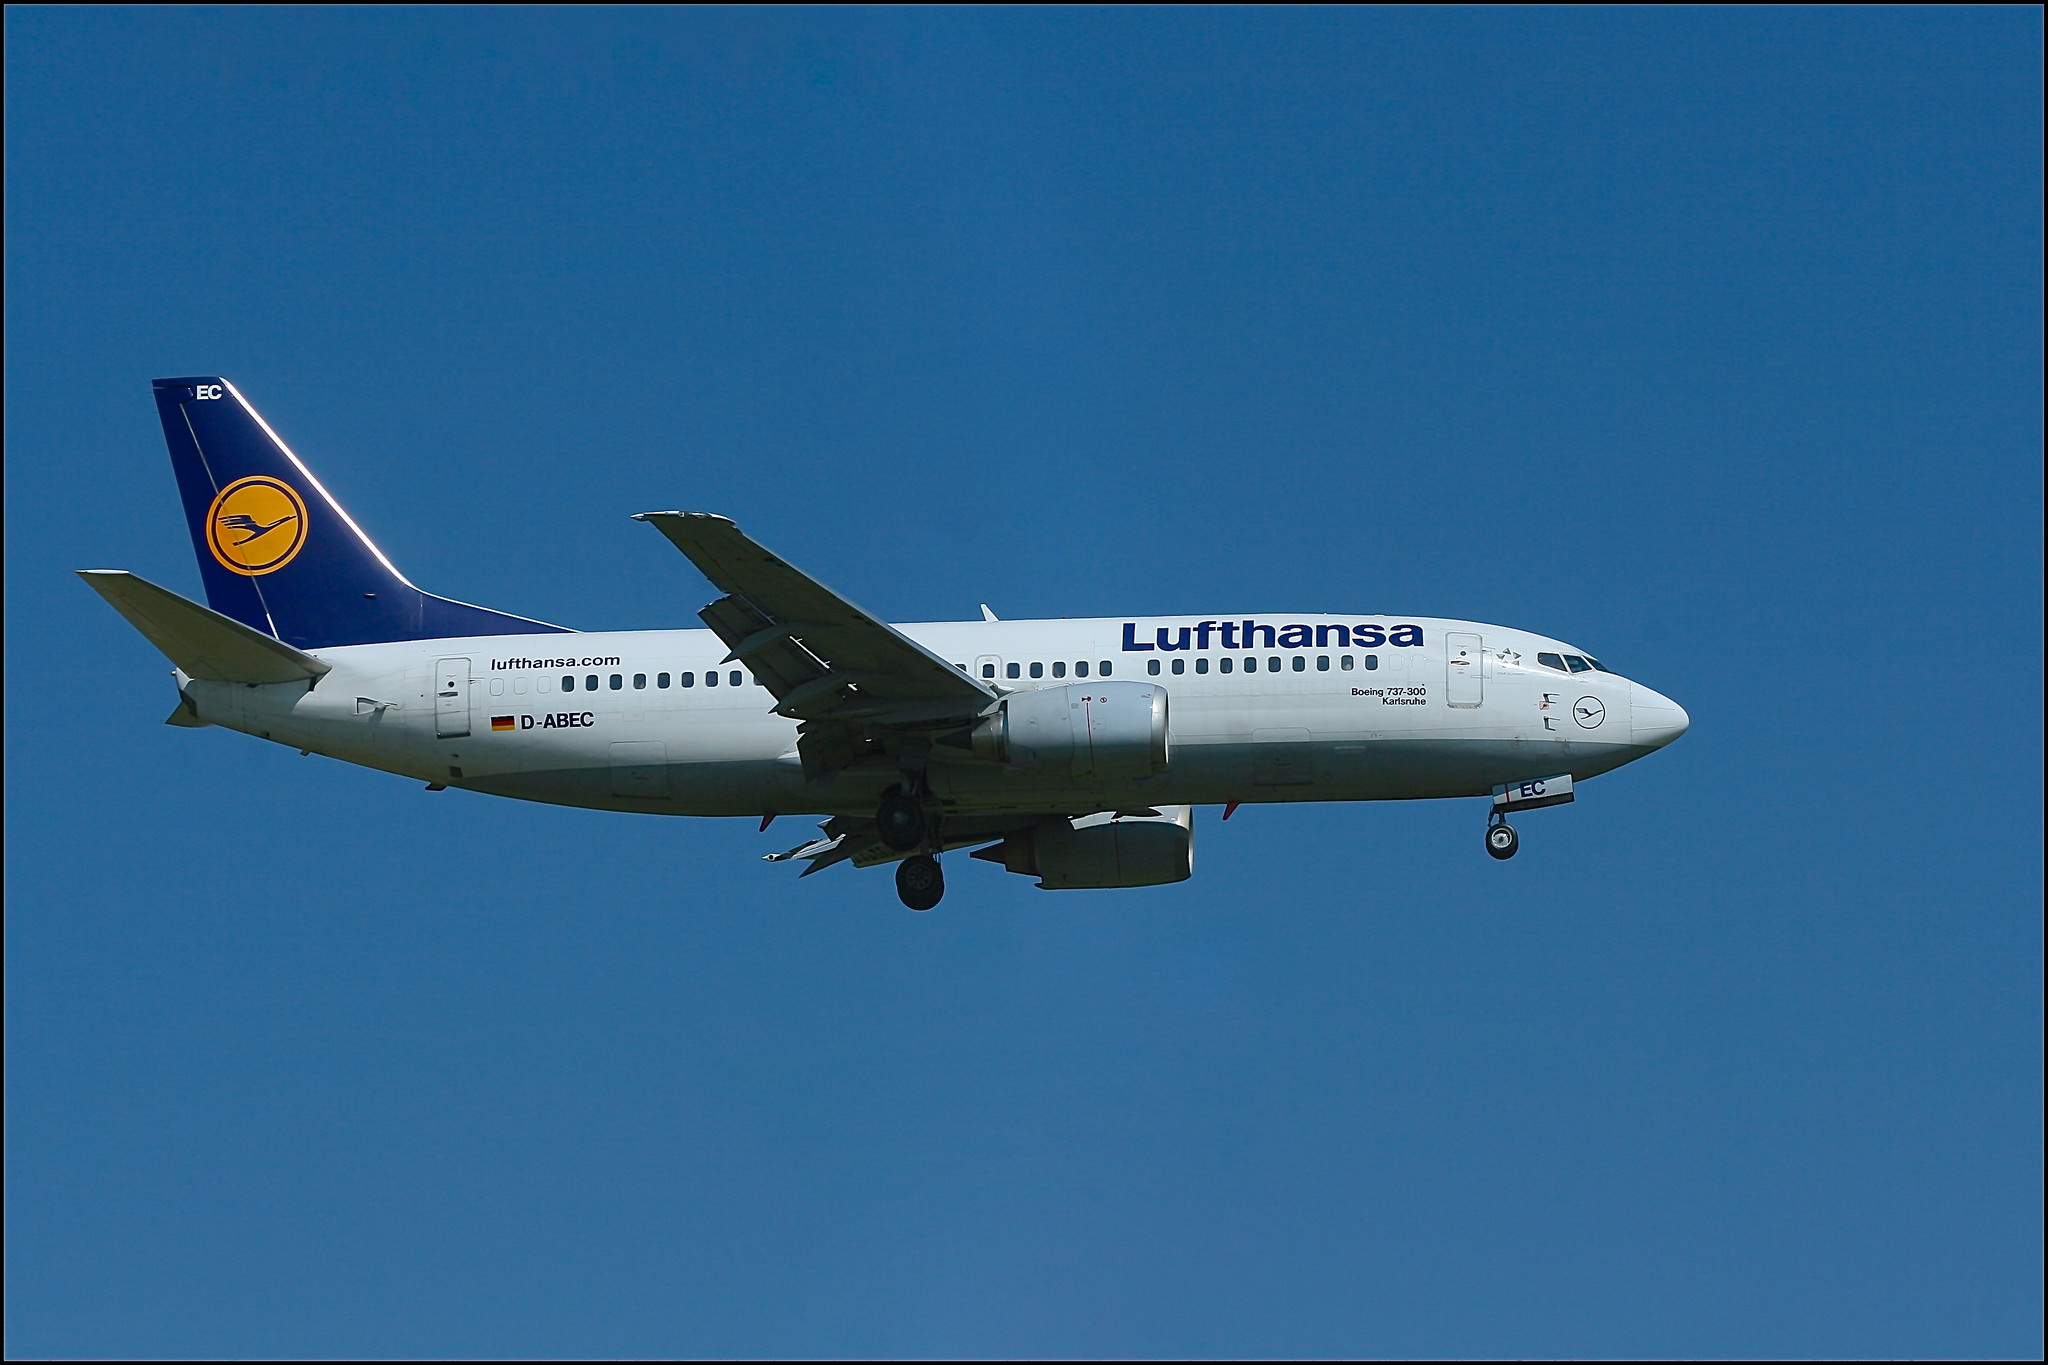 lufthansa bids farewell to its boeing 737 fleet as d abec operates rh airsoc com